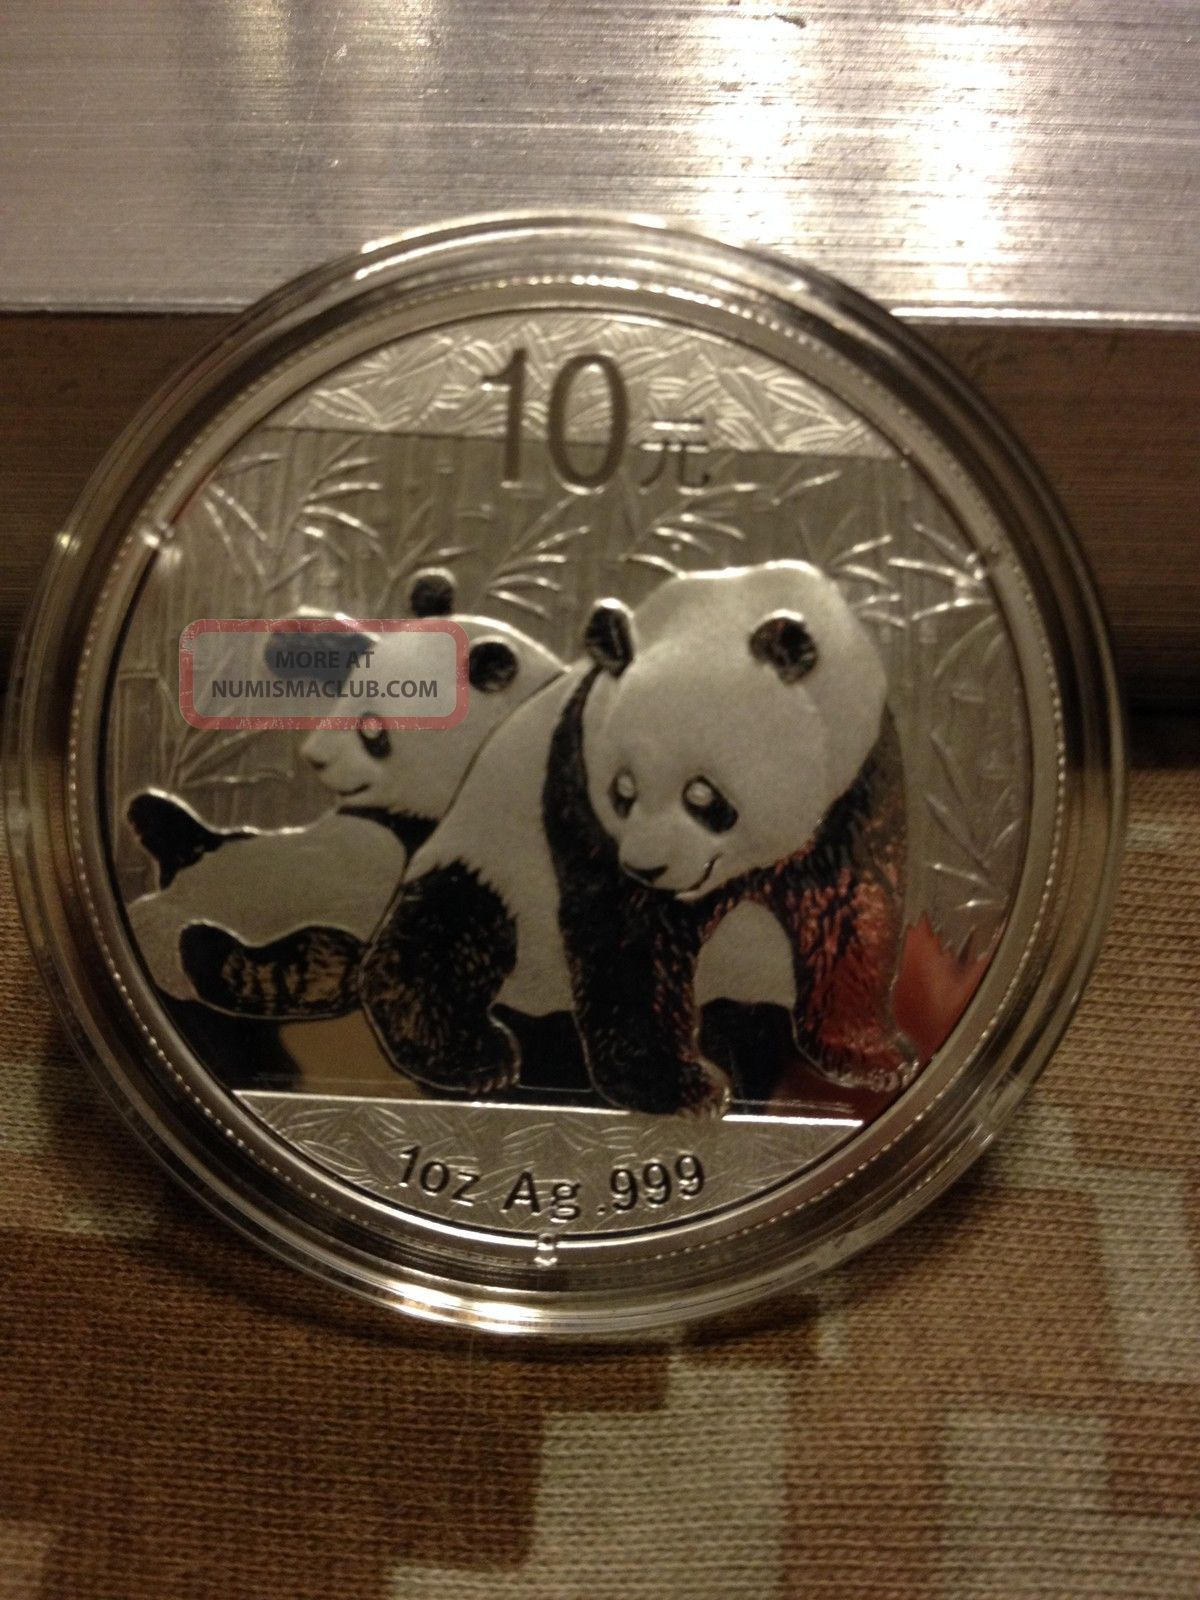 2010 Chinese Panda 1oz Silver Bu Coin Silver photo